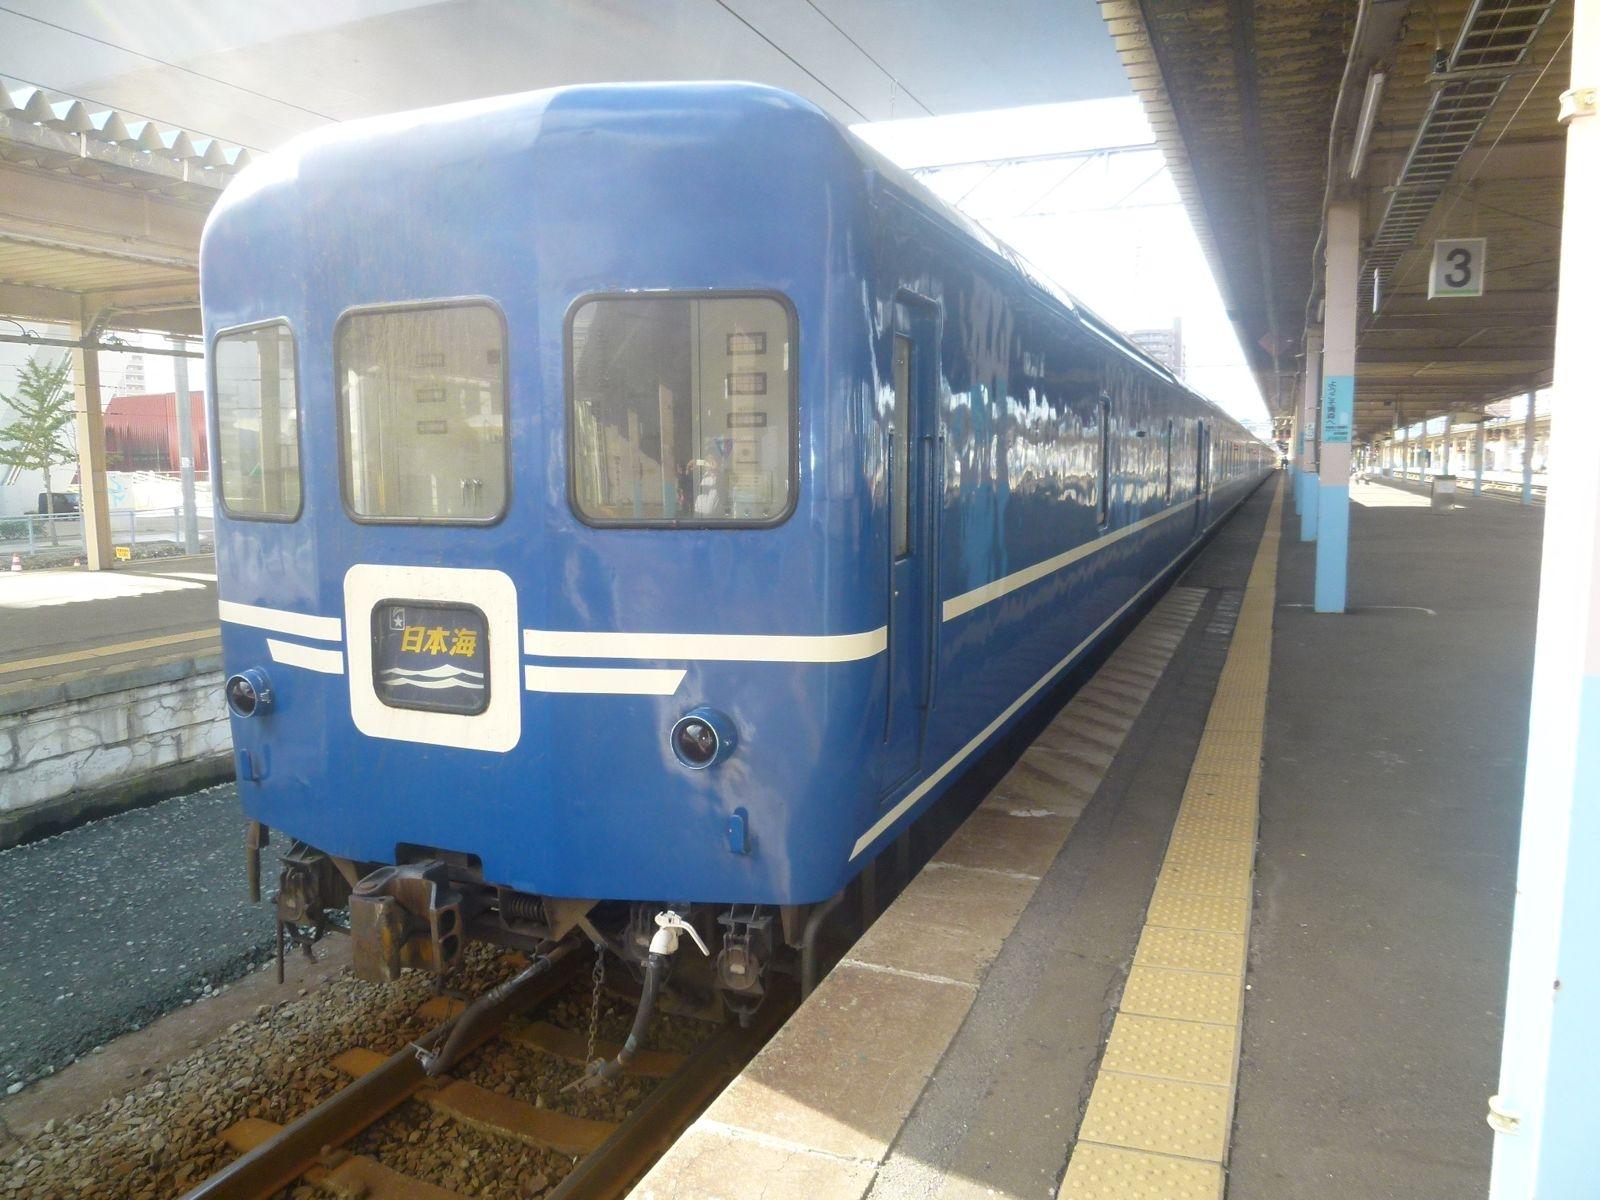 青森駅に到着した寝台特急日本海号(JPG-246k)